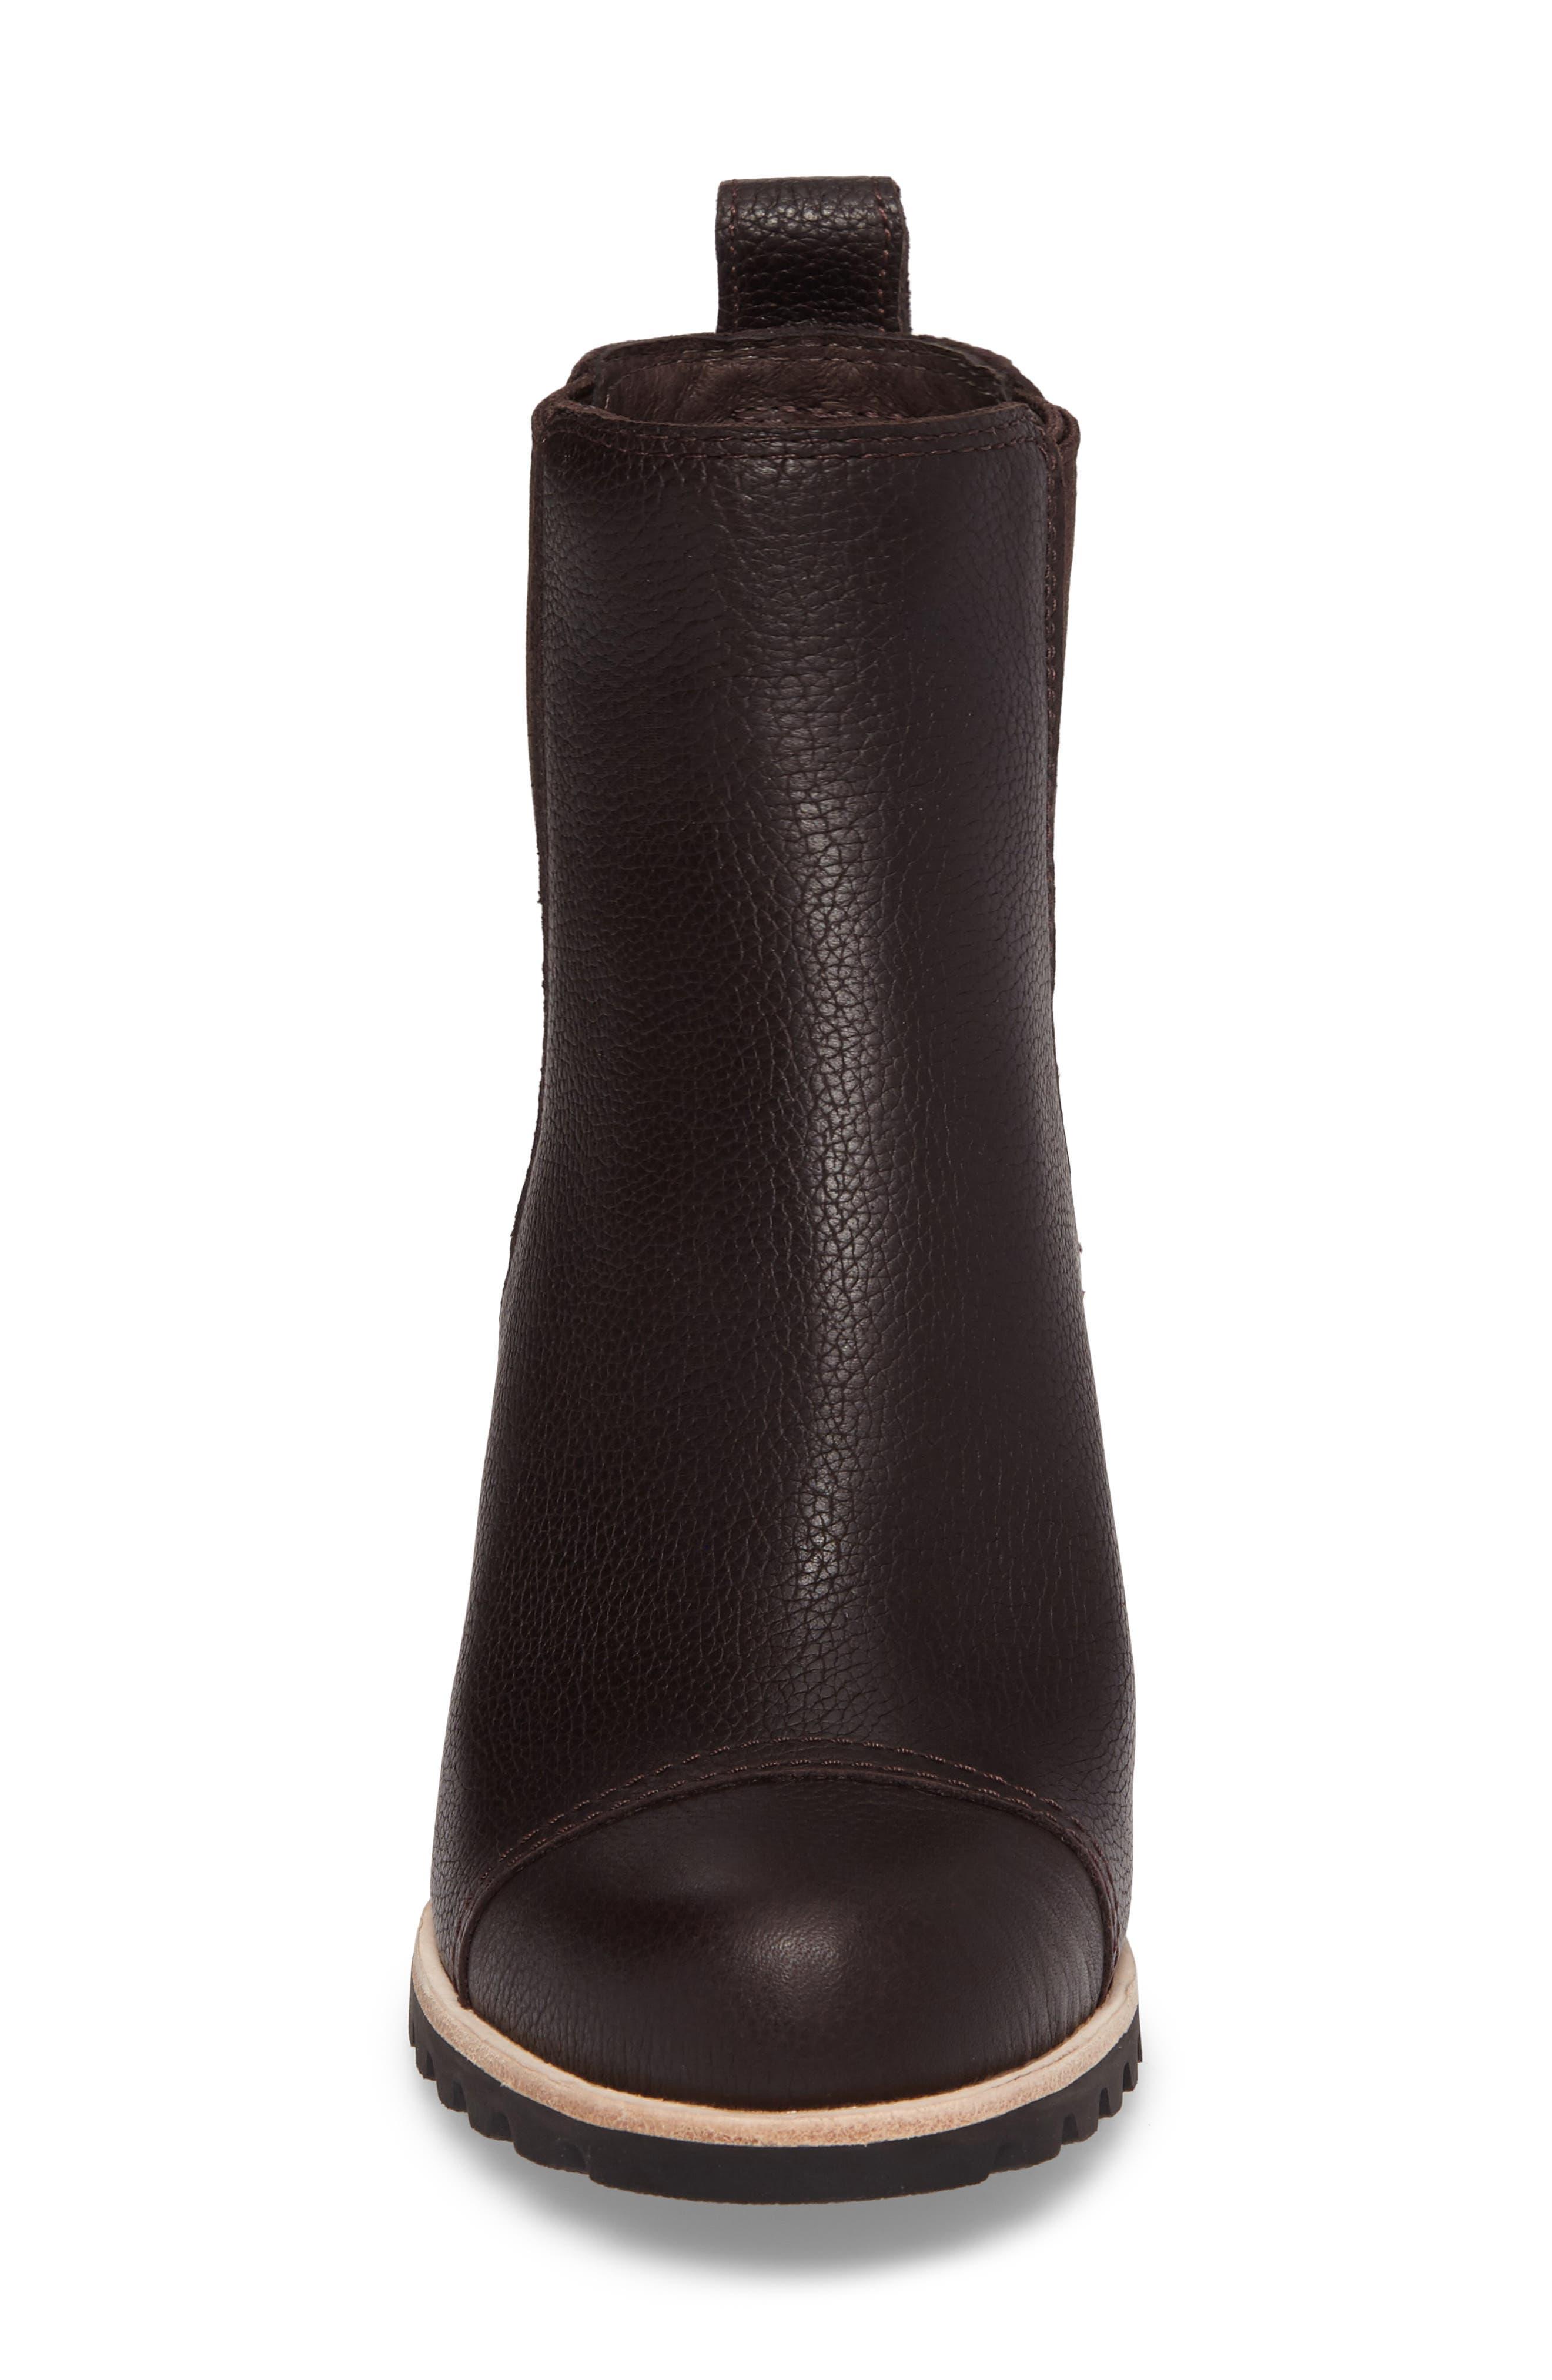 Pax Waterproof Wedge Boot,                             Alternate thumbnail 8, color,